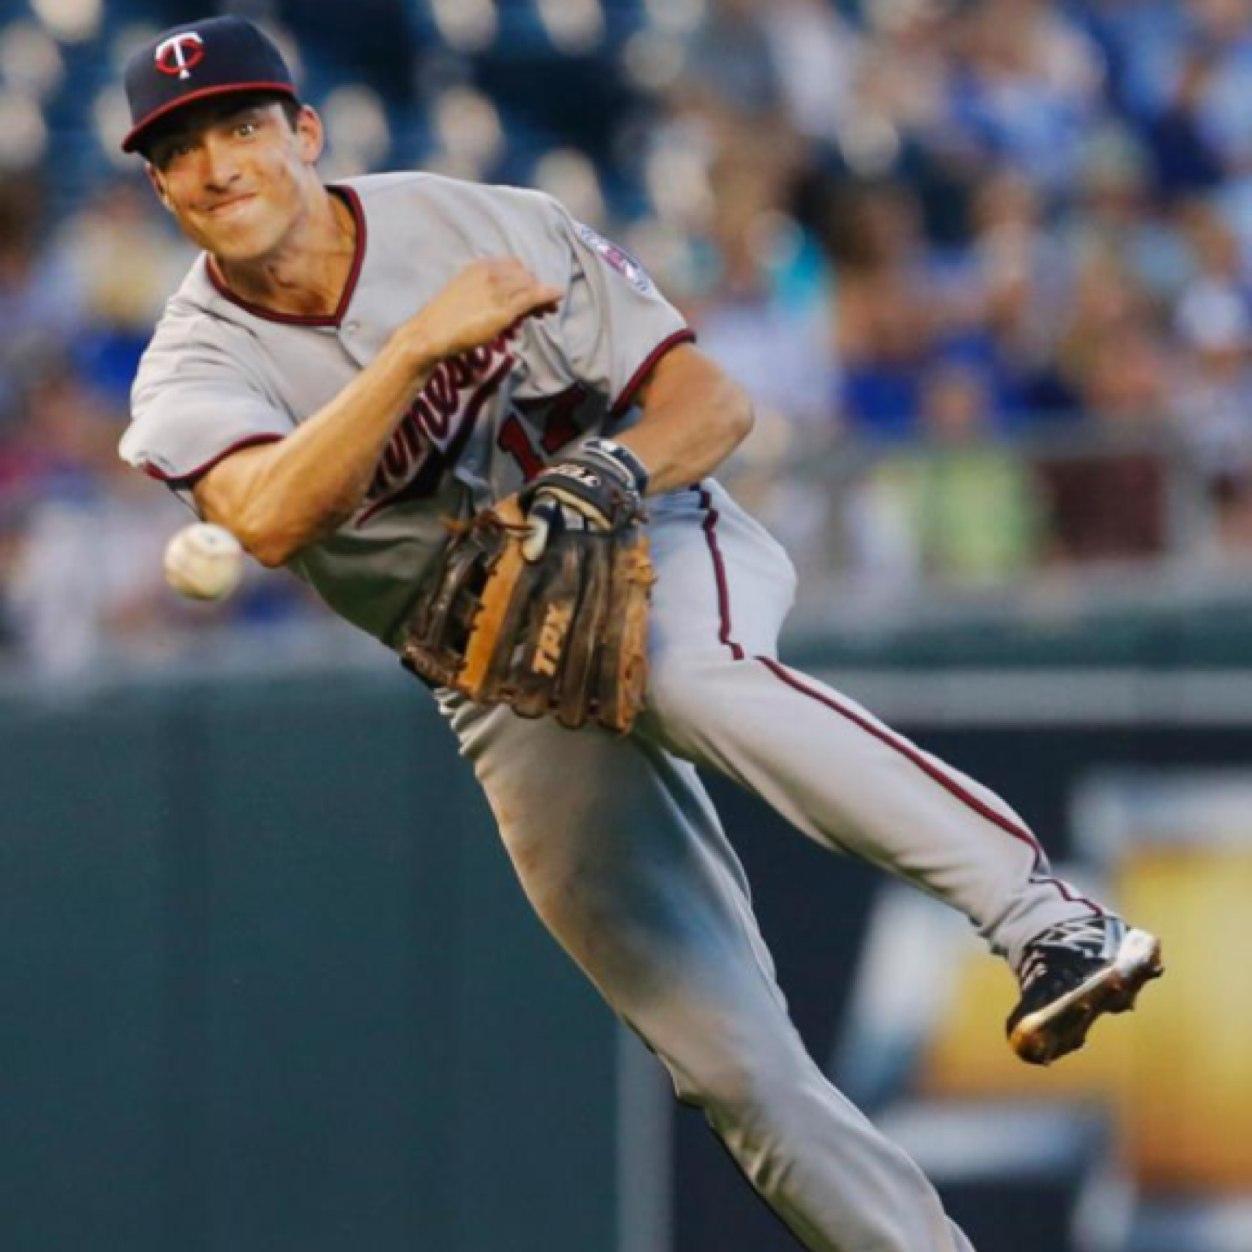 10 life lessons learned from baseball pro baseball insider - HD1252×1252